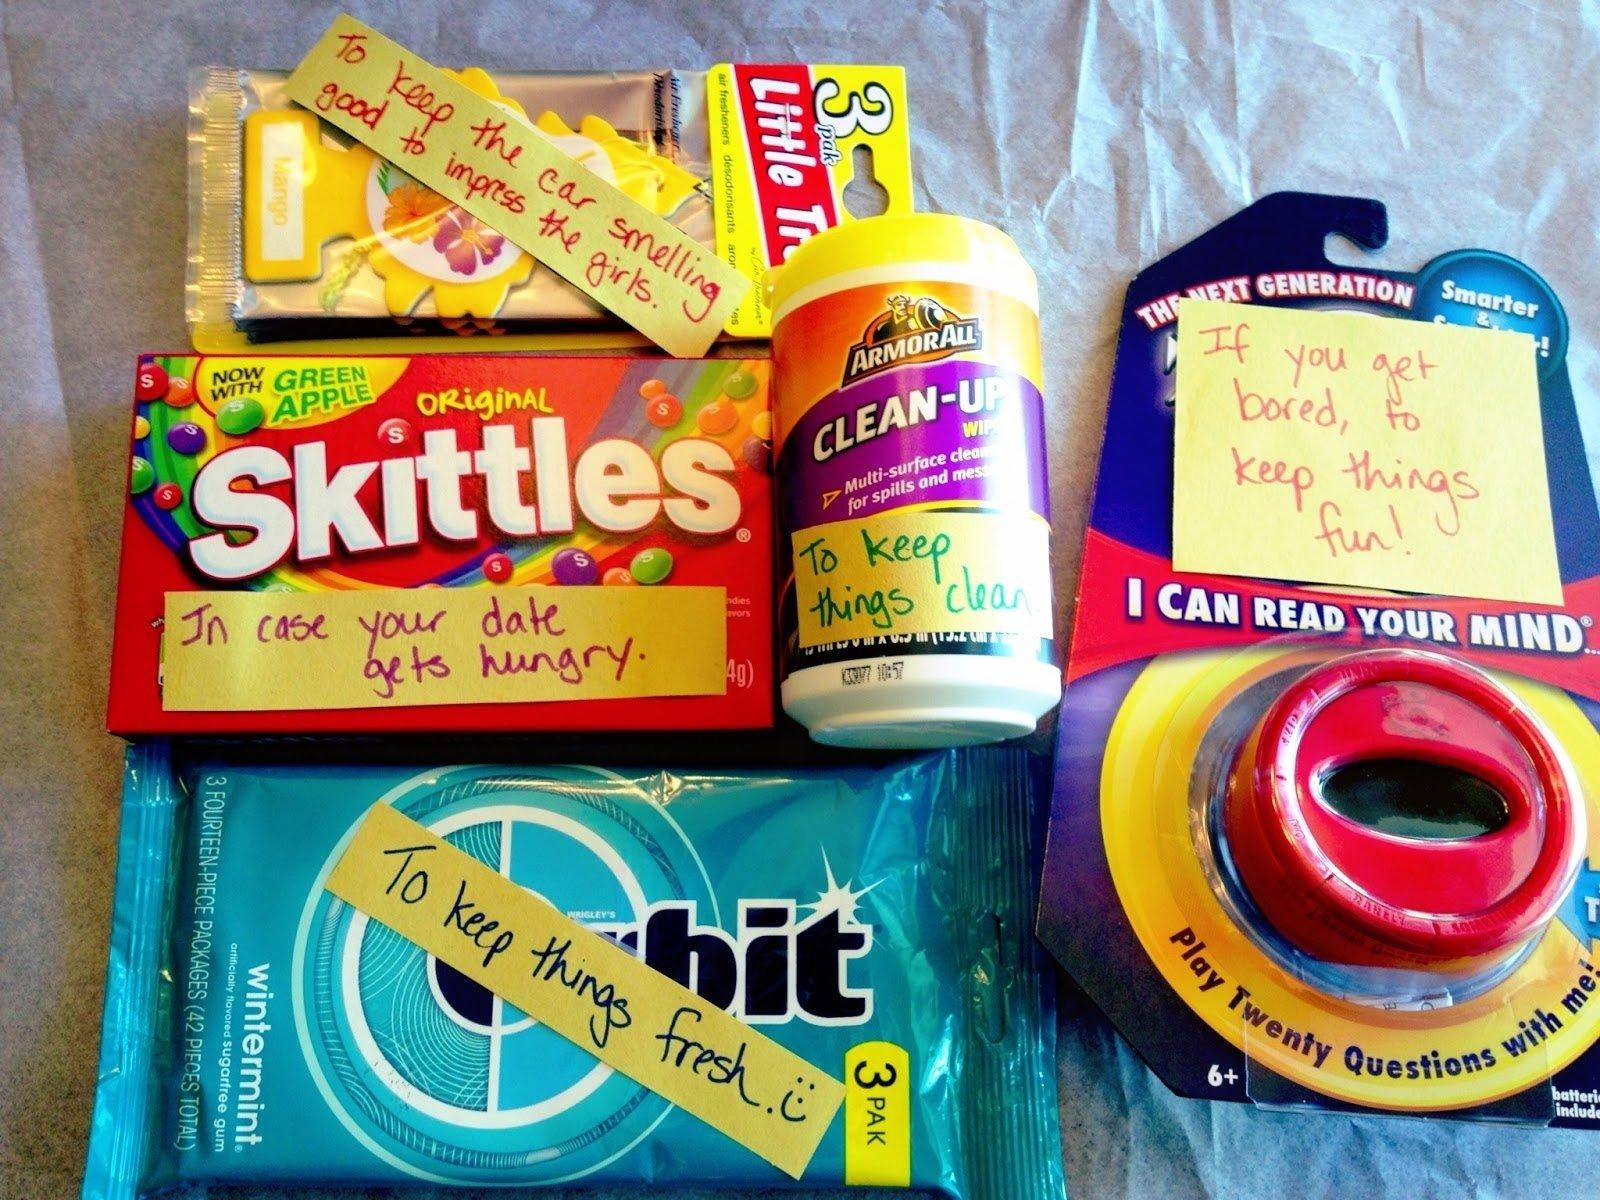 10 Fabulous Birthday Ideas For A 13 Year Old Girl 16th birthday party ideas for boys bing images birthday ideas 21 2020